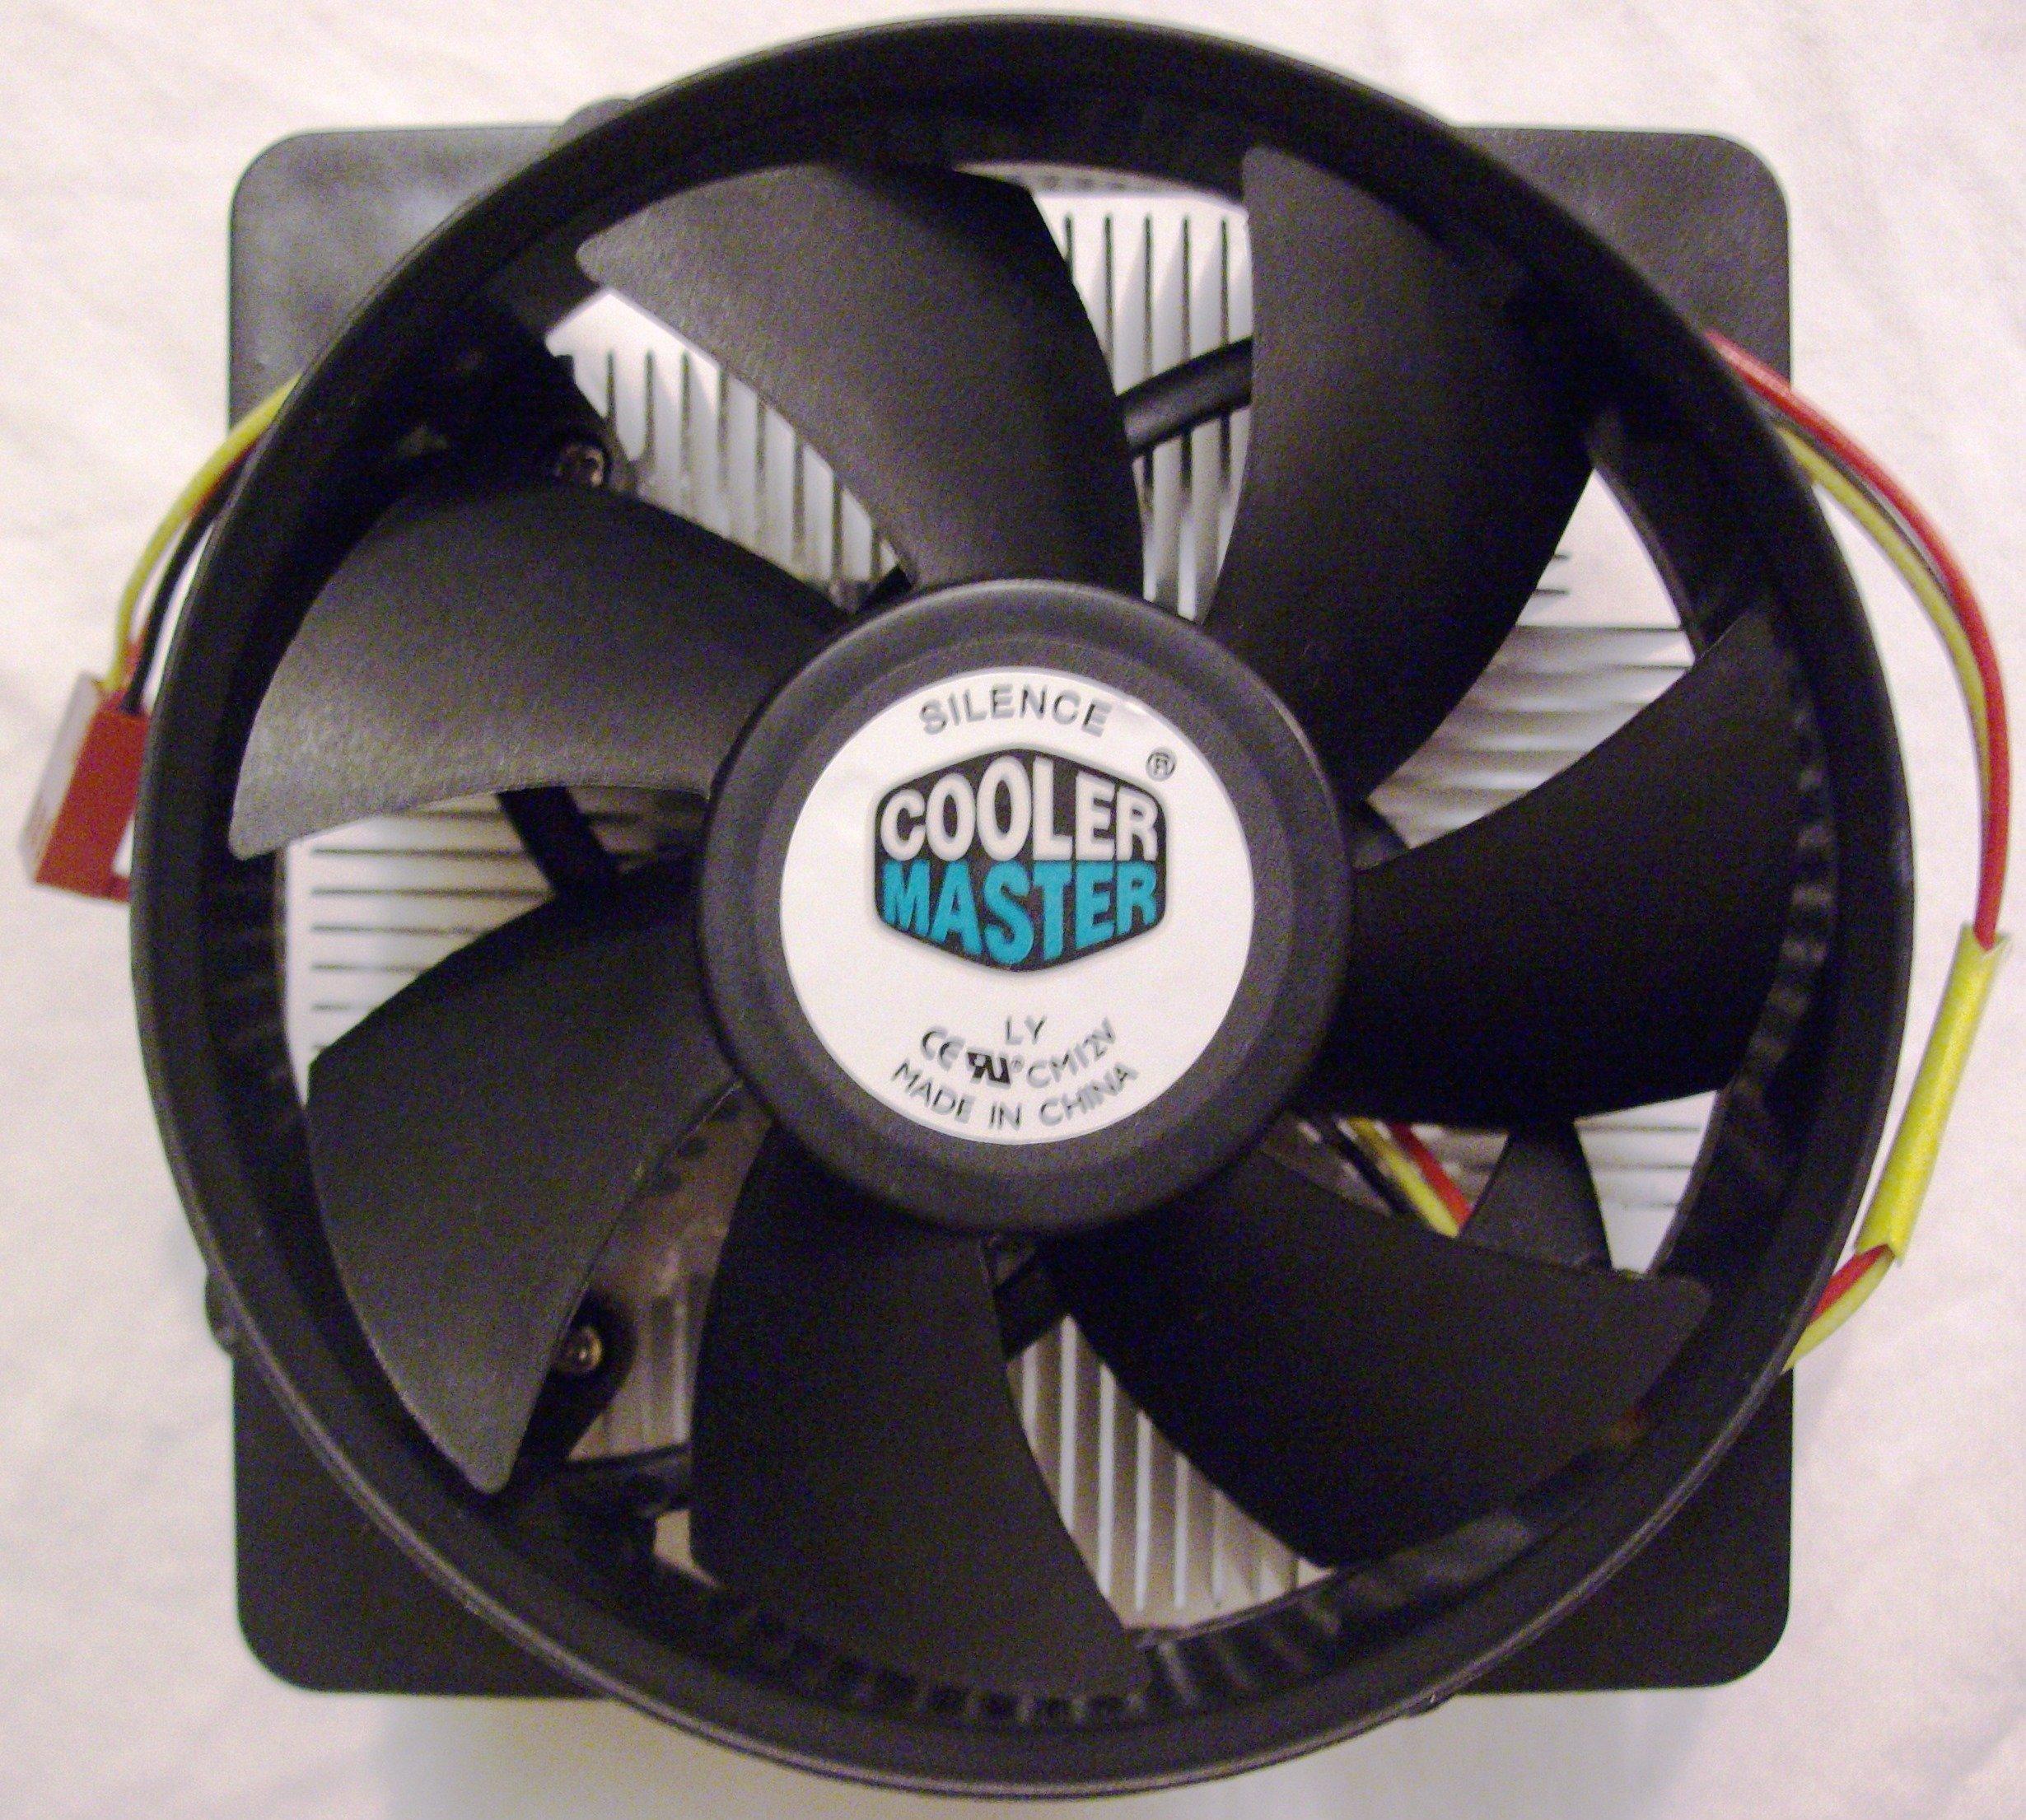 Chłodzenie procesora Cooler Master, LGA775, 3-pin - 7161512076